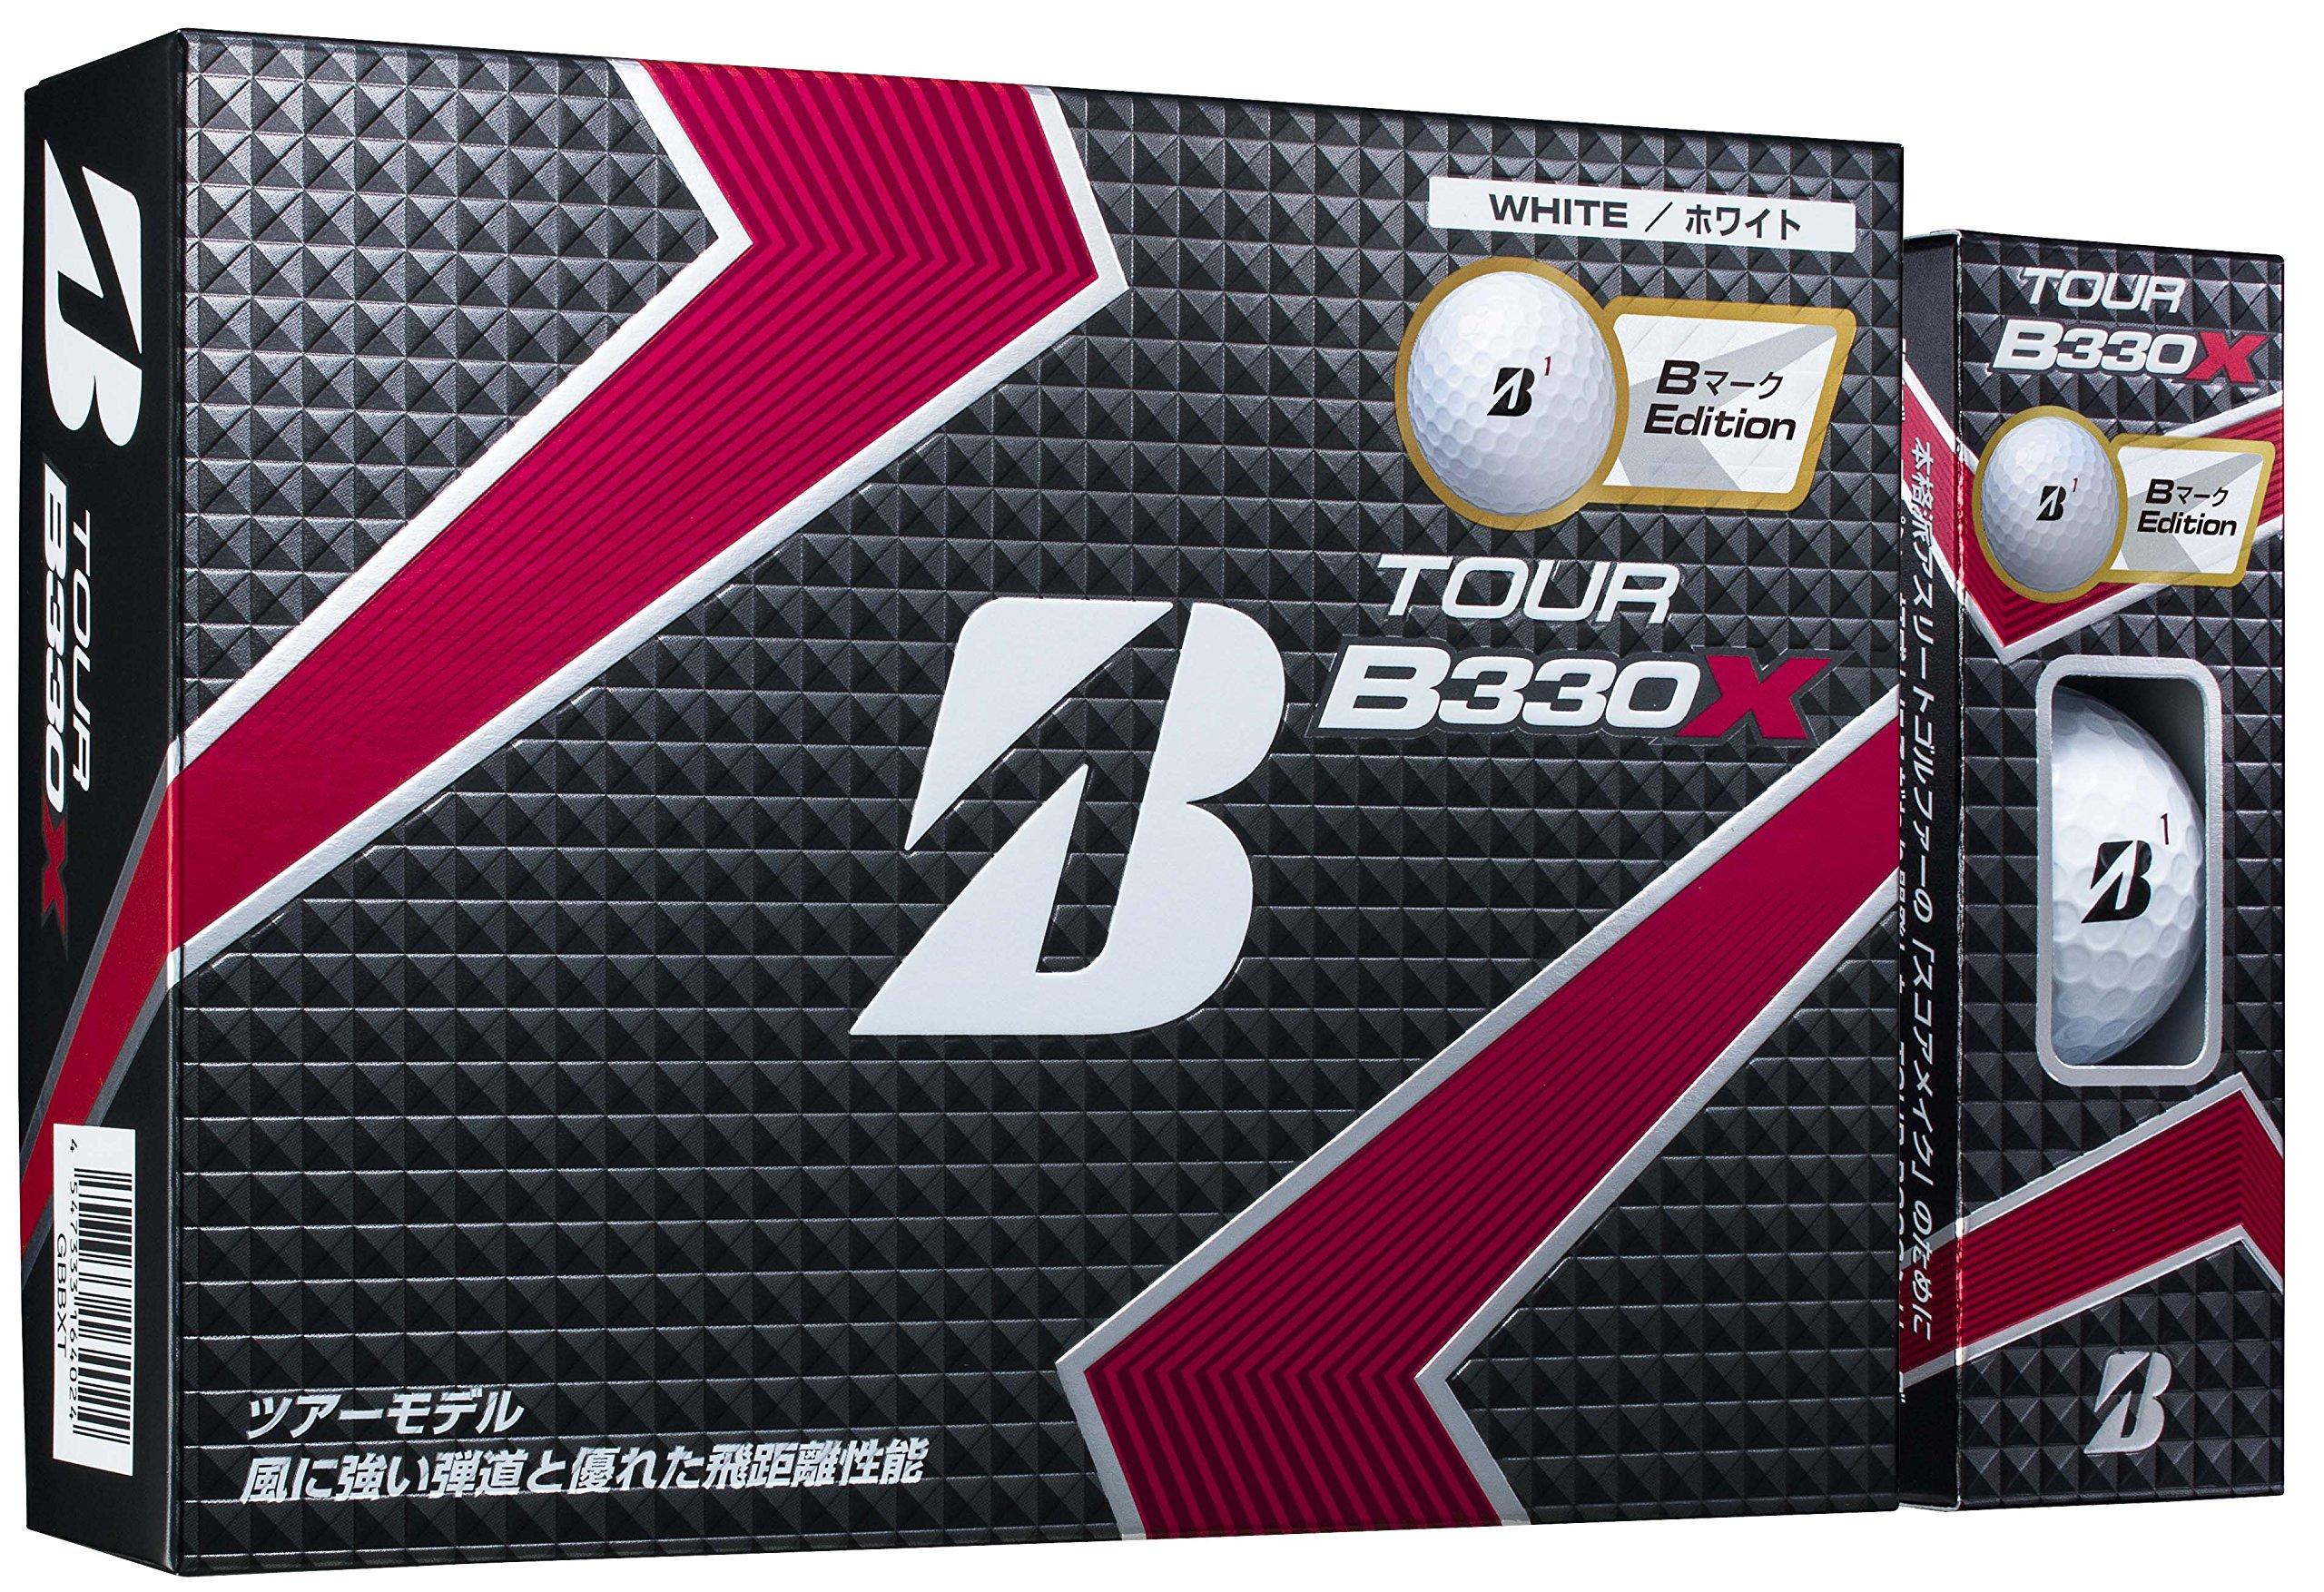 Bridgestone Golf TOUR B330X B-Mark Edition 2016